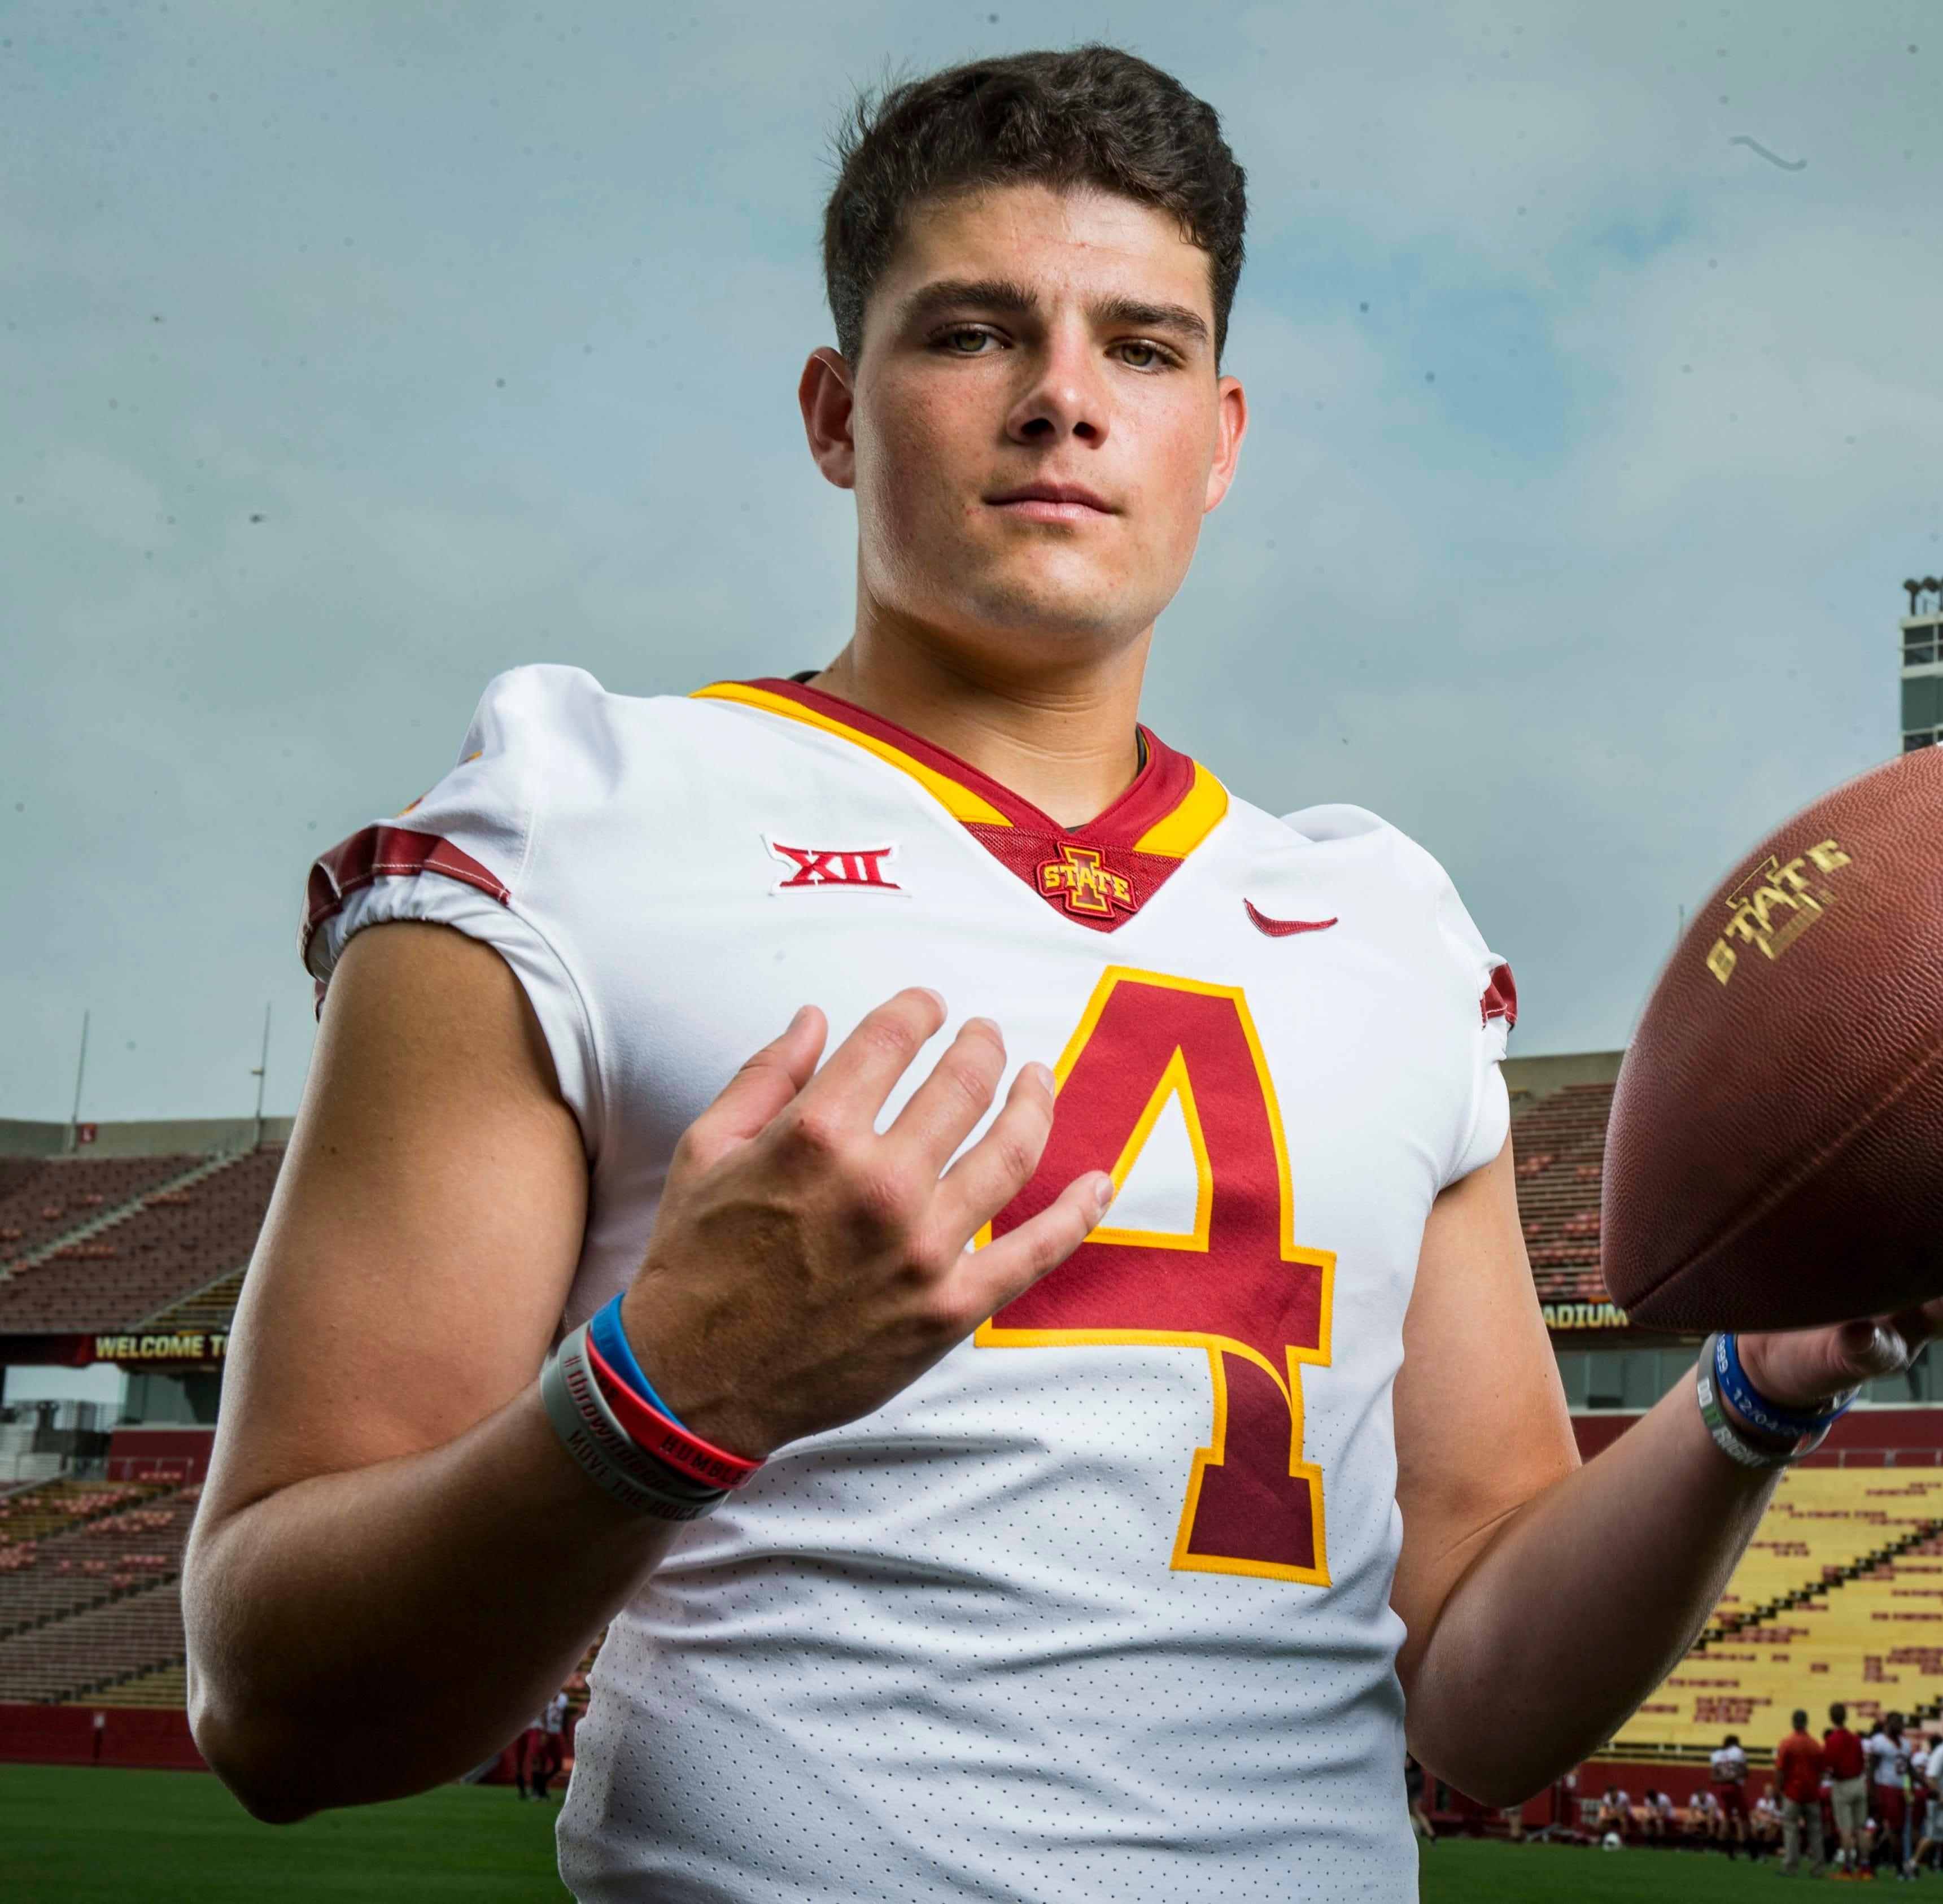 Former Iowa State quarterback Zeb Noland finds a new school